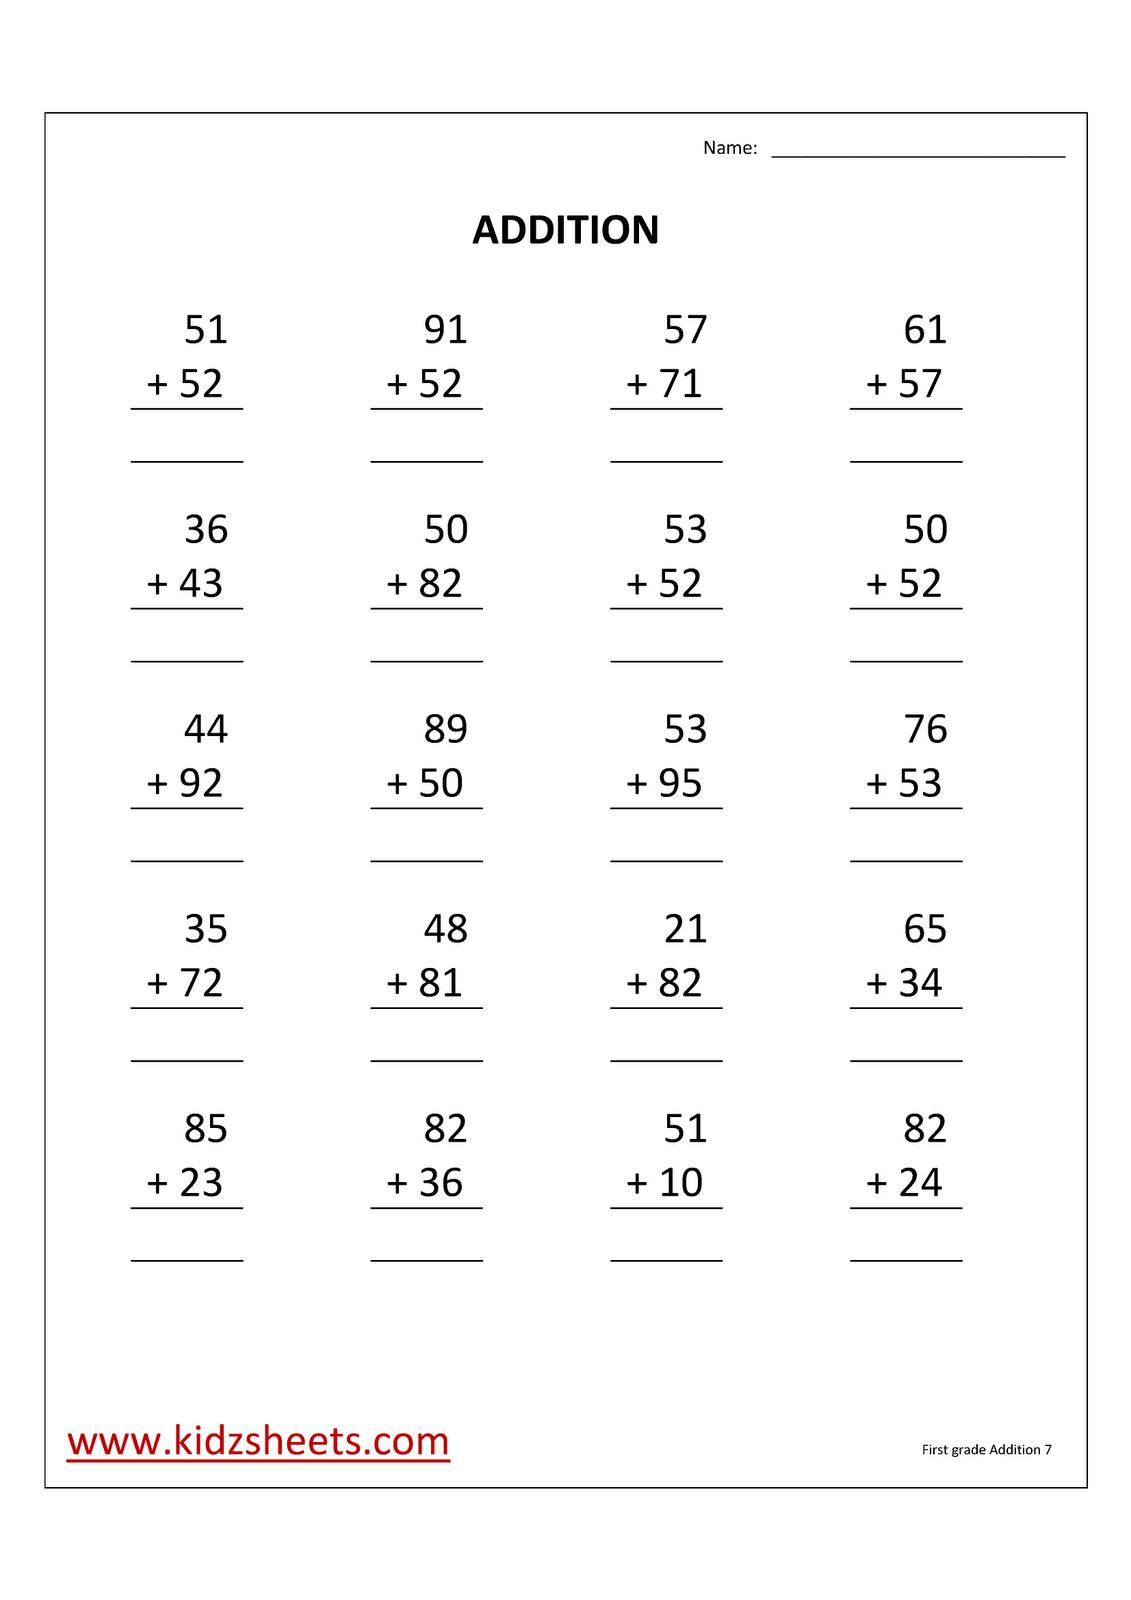 Kidz Worksheets: First Grade Addition Worksheet7